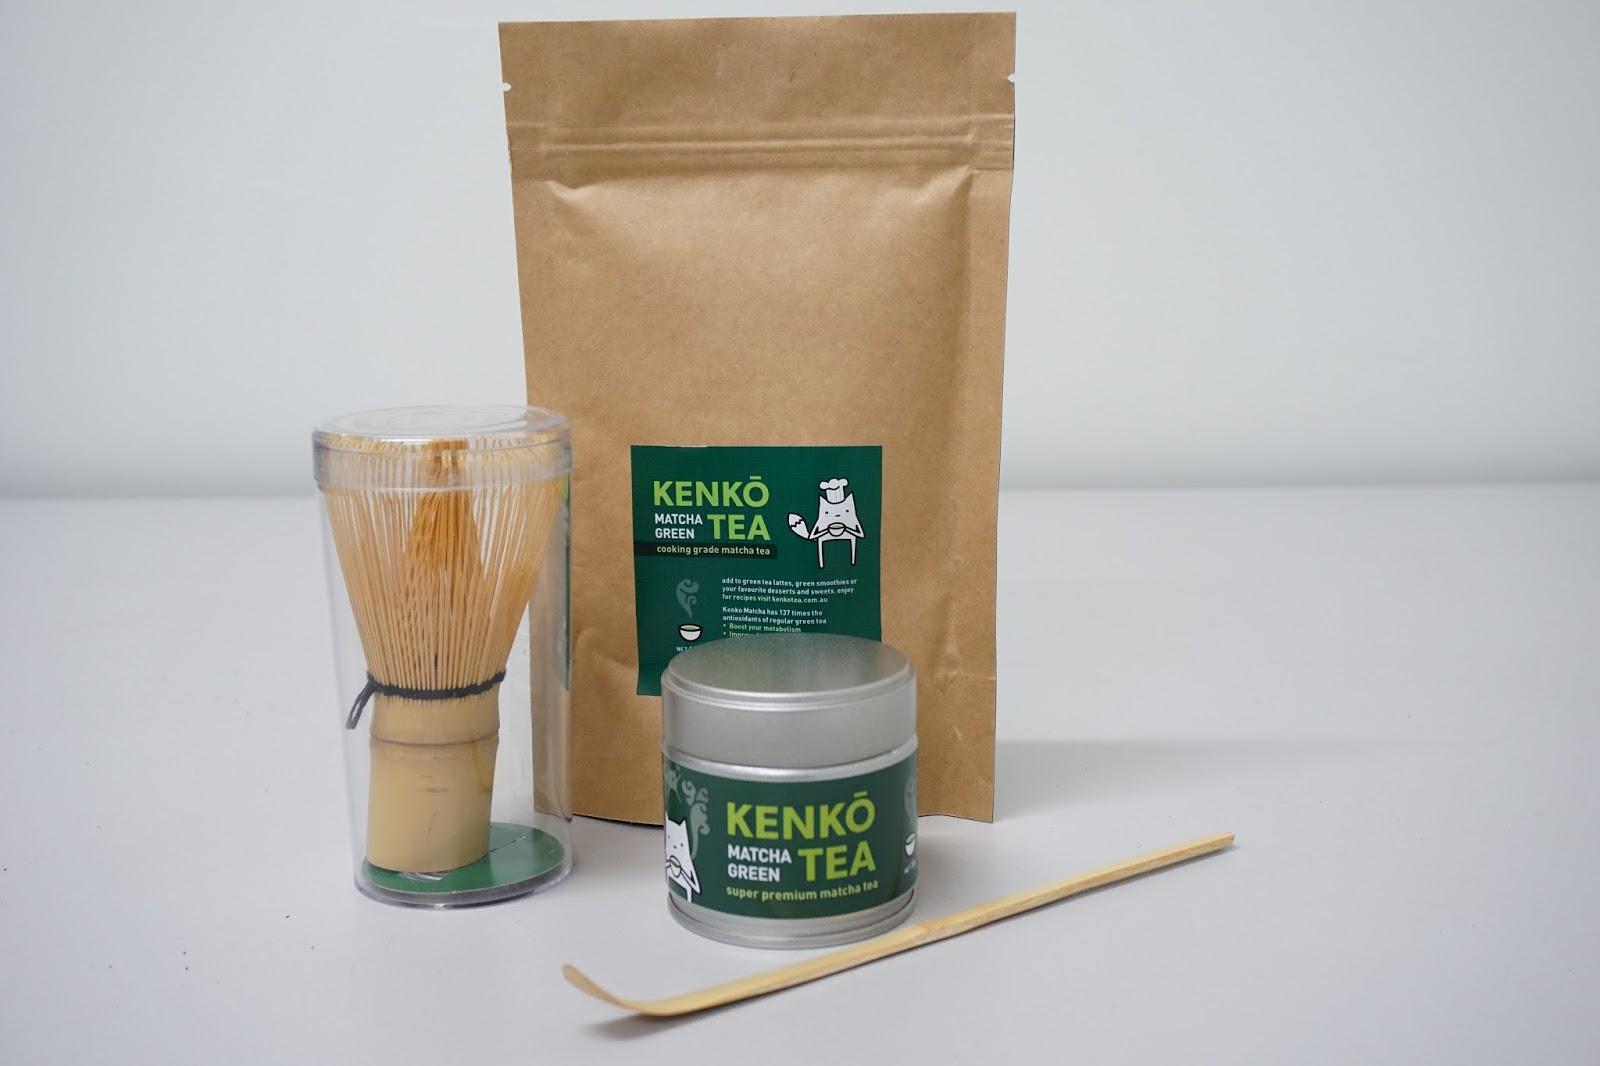 Kenko Matcha Tea Review